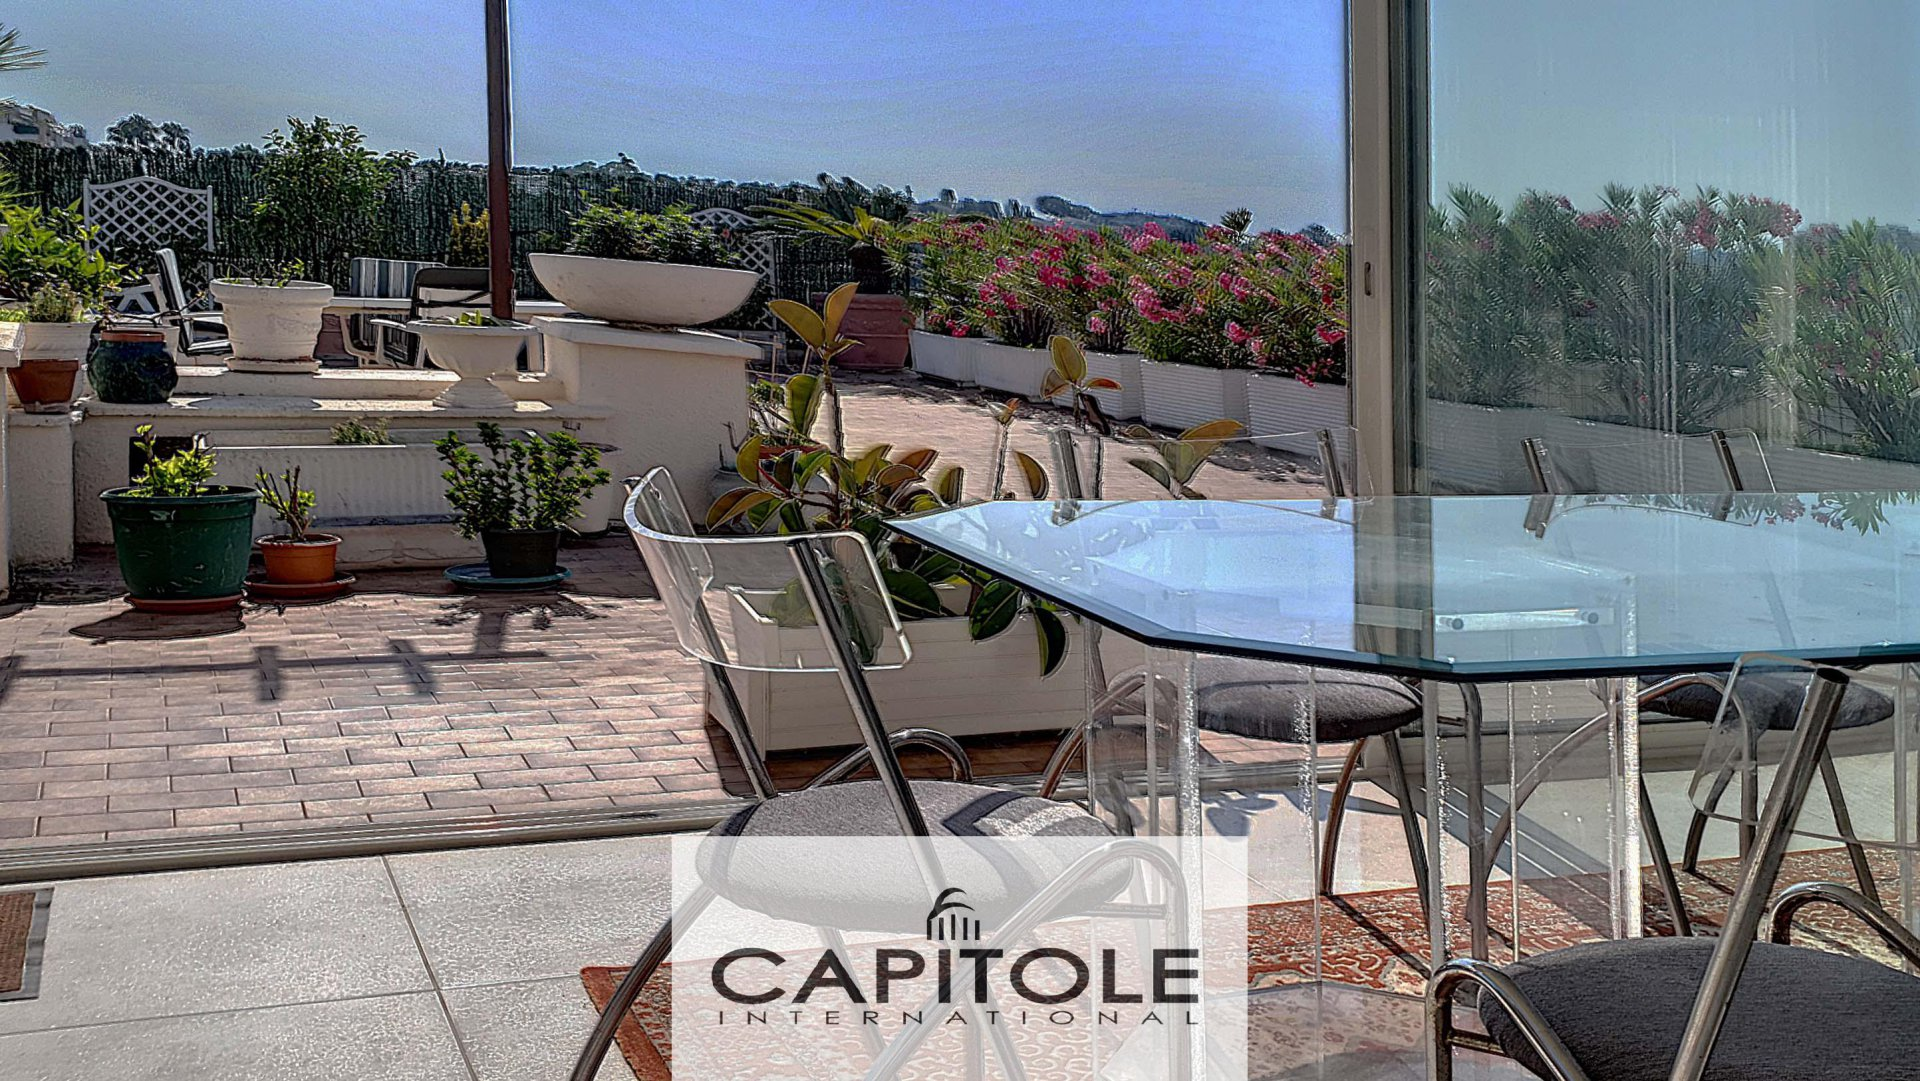 A vendre, Antibes,  villa toit appartement 3/4 pièces, aperçu mer, terrasse 150 m², garage